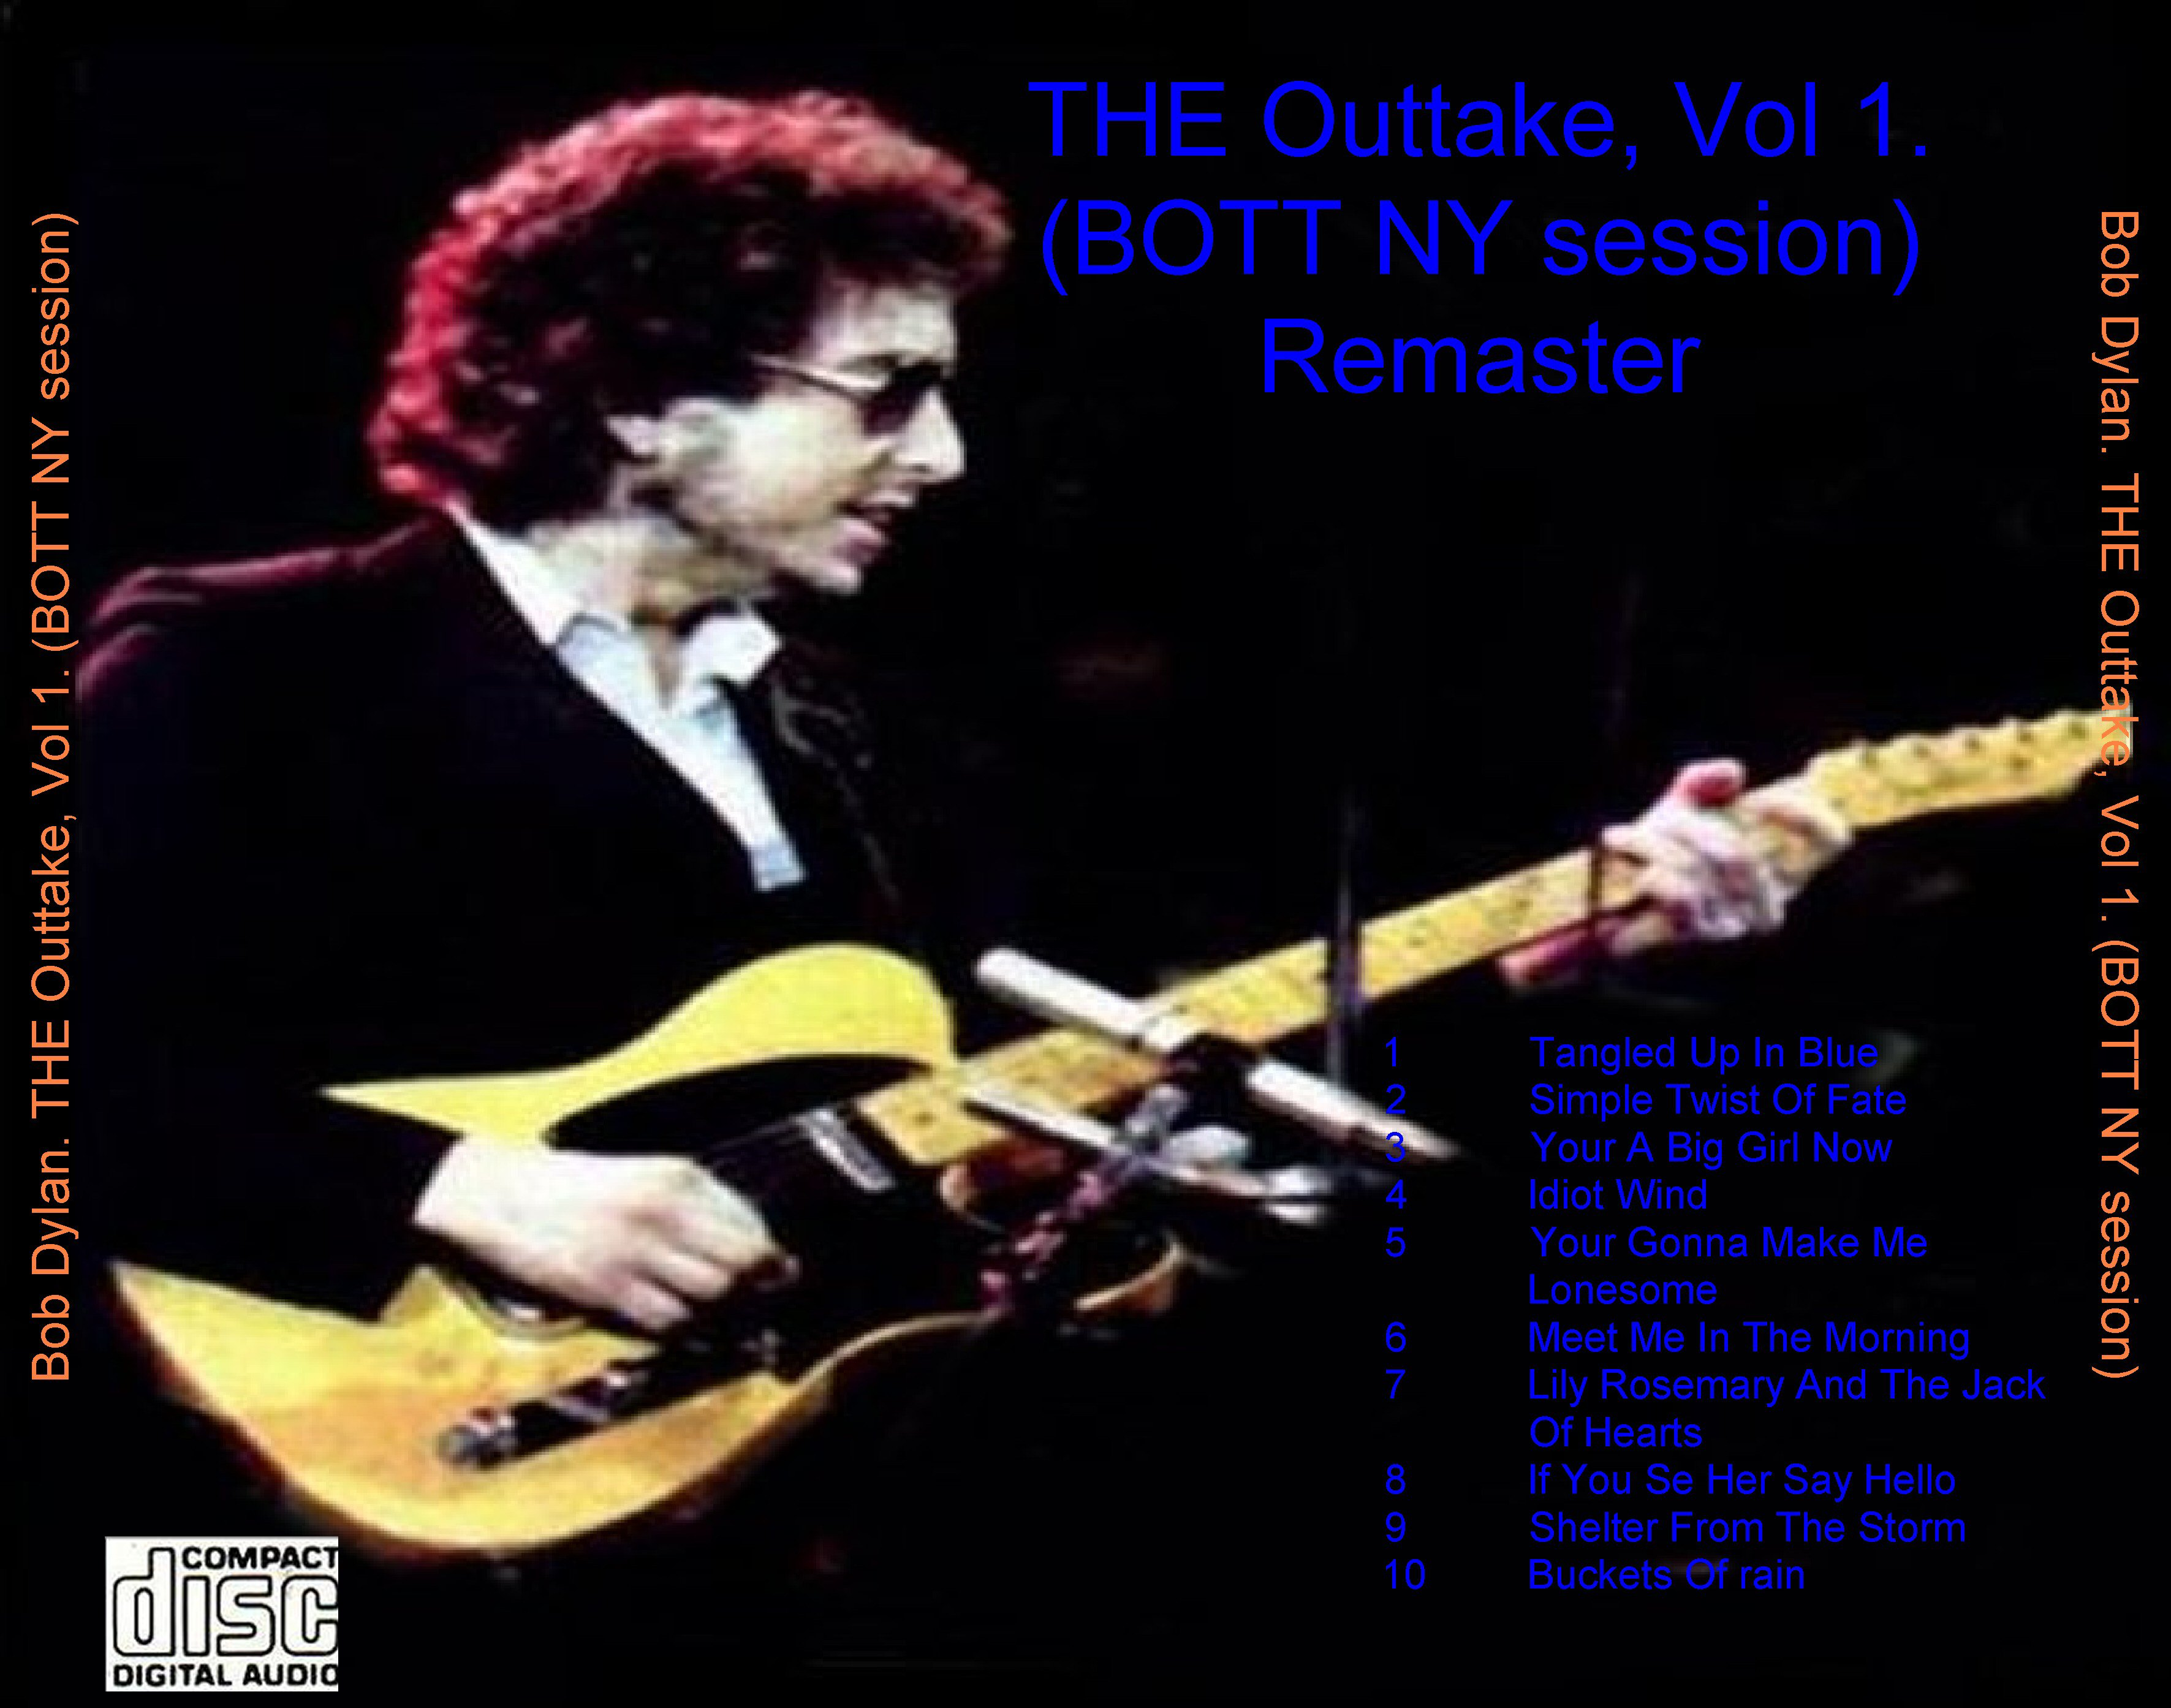 sugarmegs audio setlist bobdylan1974 09 16to19bloodonthetrackssessions4unreleasedtracksaandrstudiosnyc 3 jpg